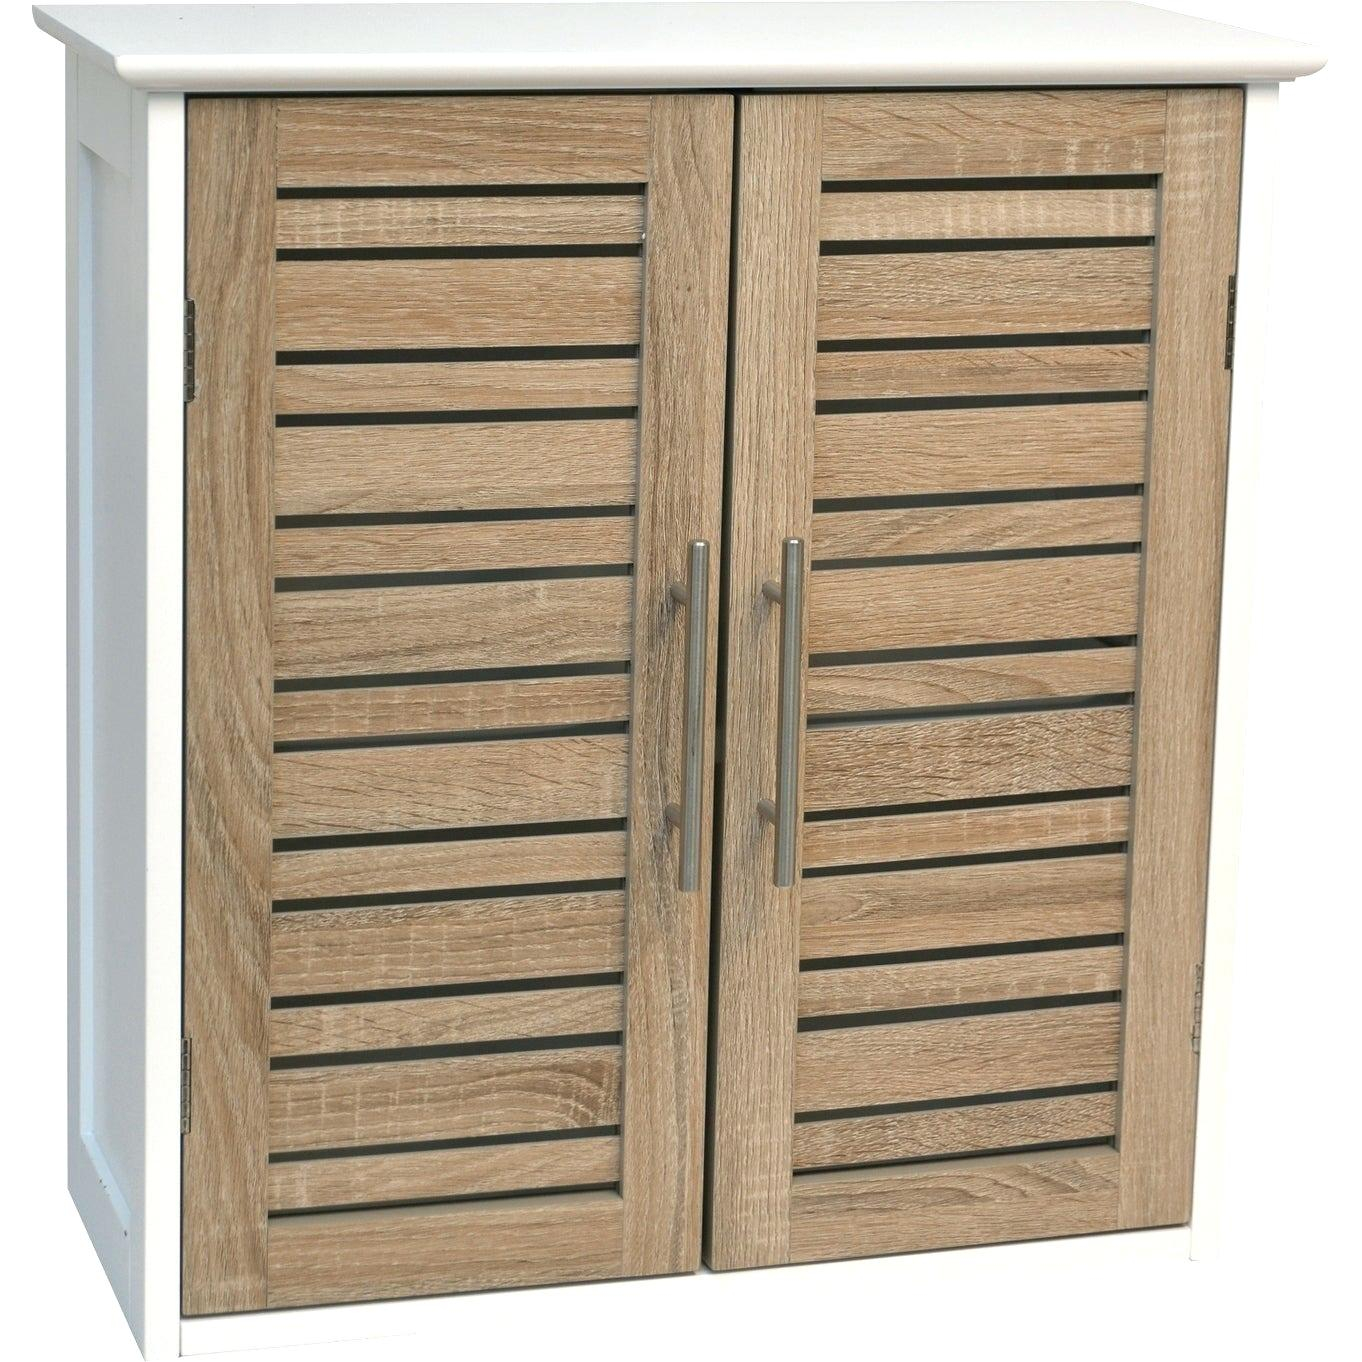 Oak Bathroom Storage Cabinet Shouter intended for measurements 1362 X 1362